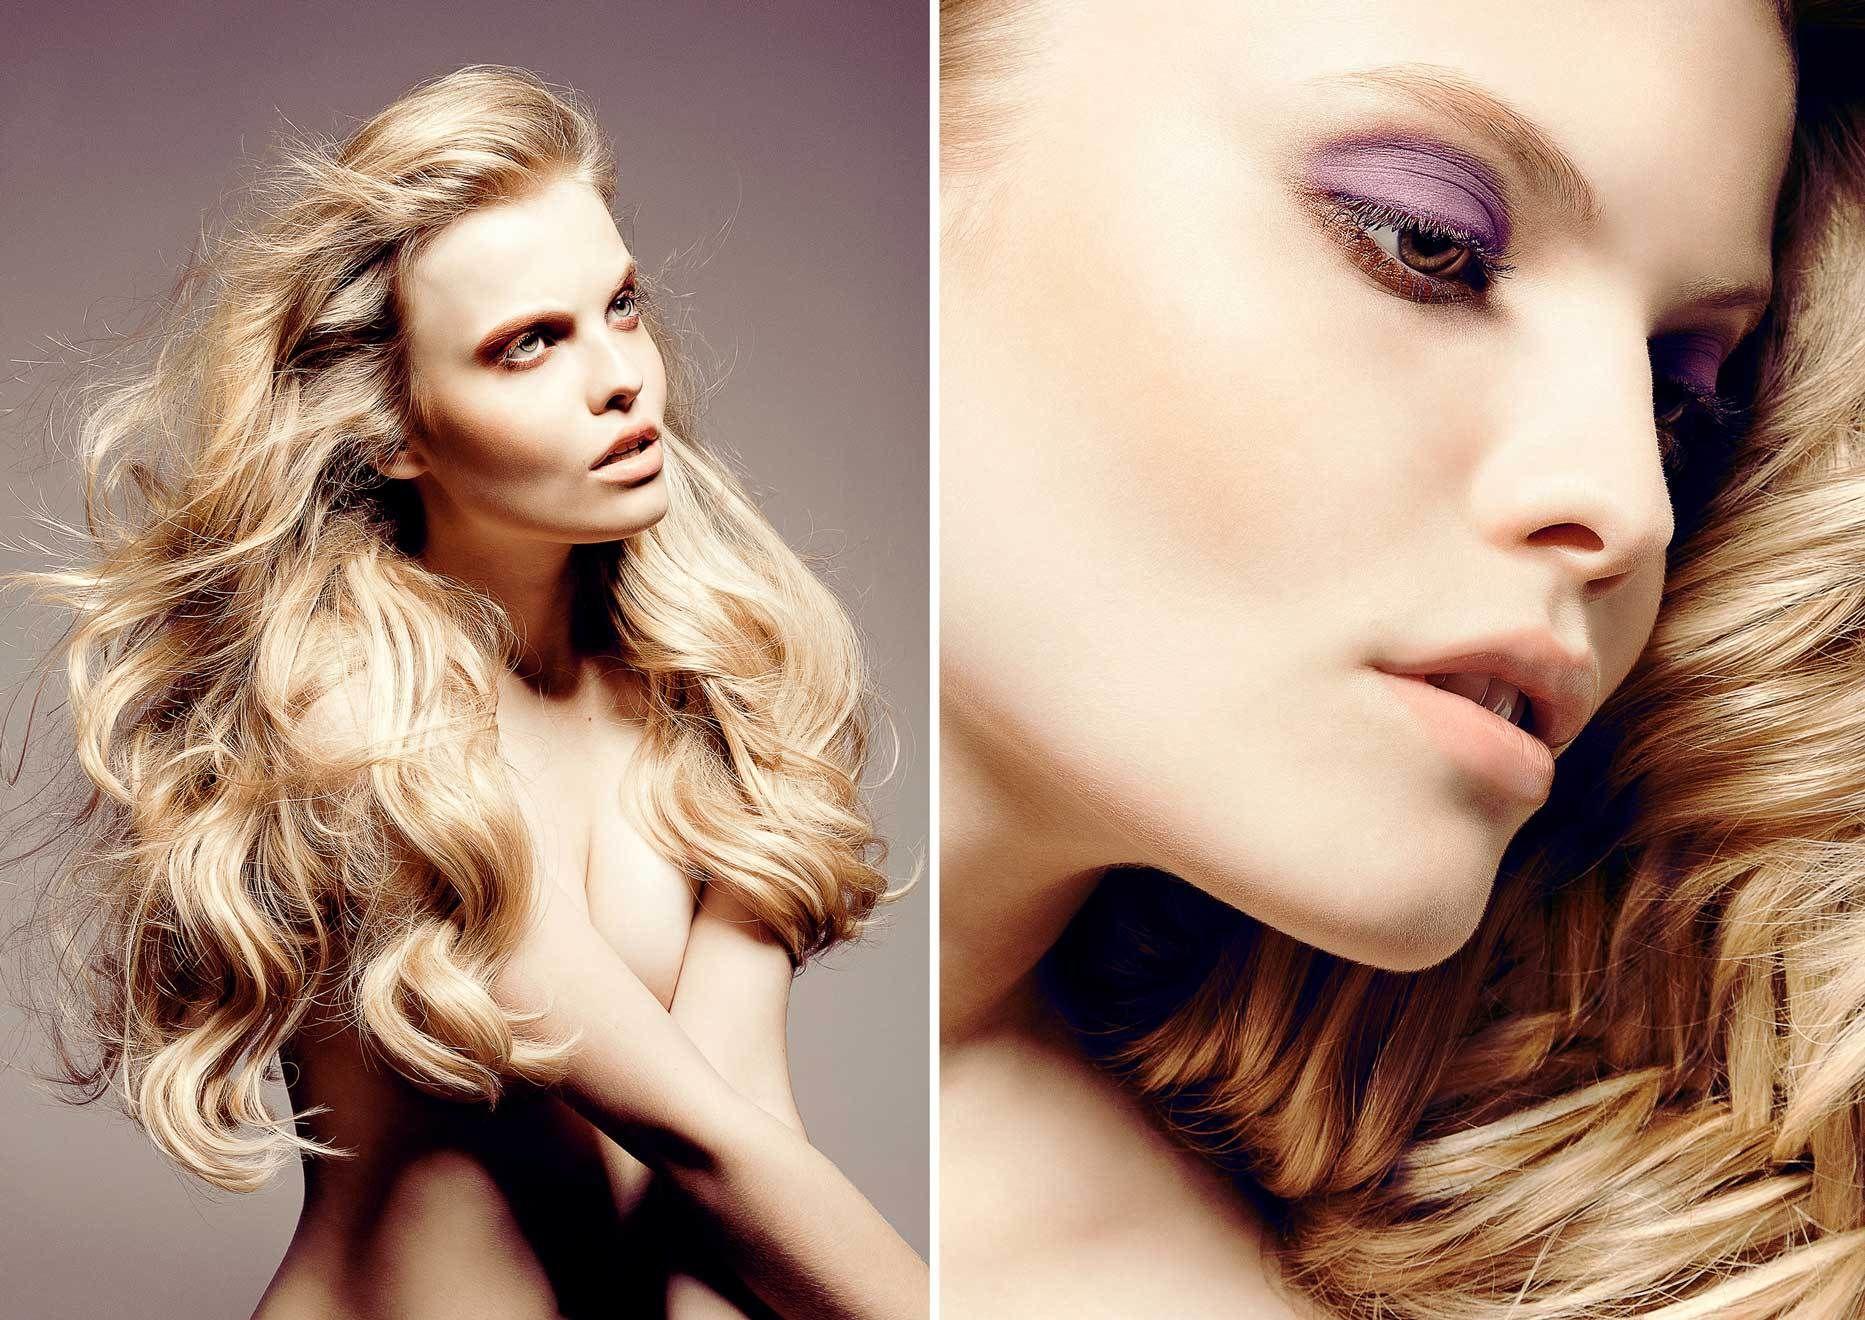 Katja Schubert - addictive hair - personal work